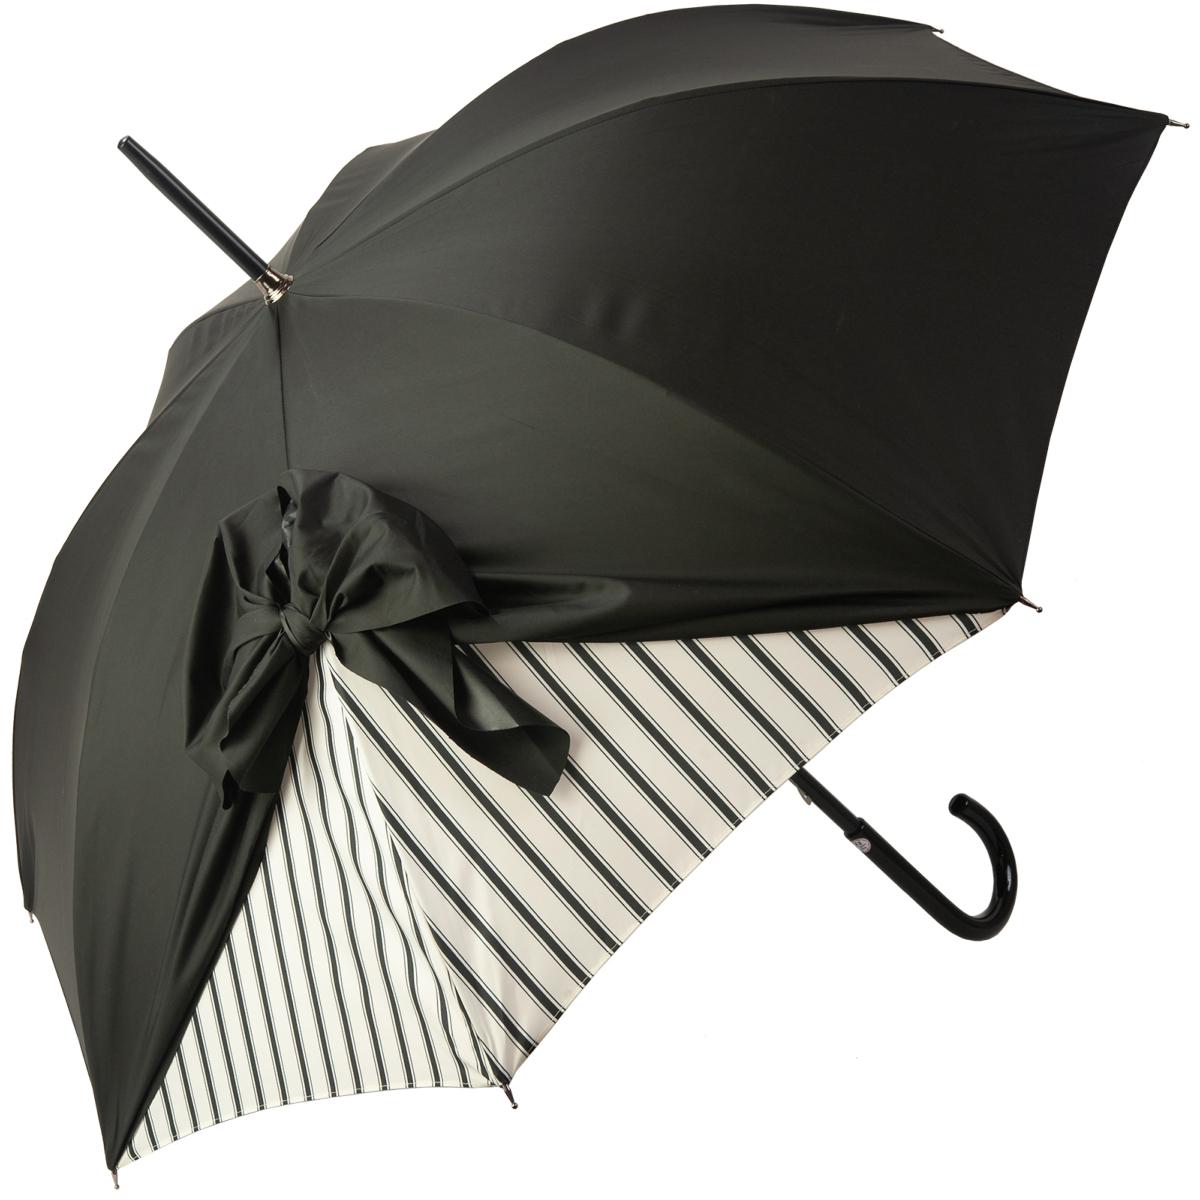 Widely Used Drape Umbrellas With Regard To Drape Bow Umbrella With Black Stripe On Creamchantal Thomass (View 20 of 20)